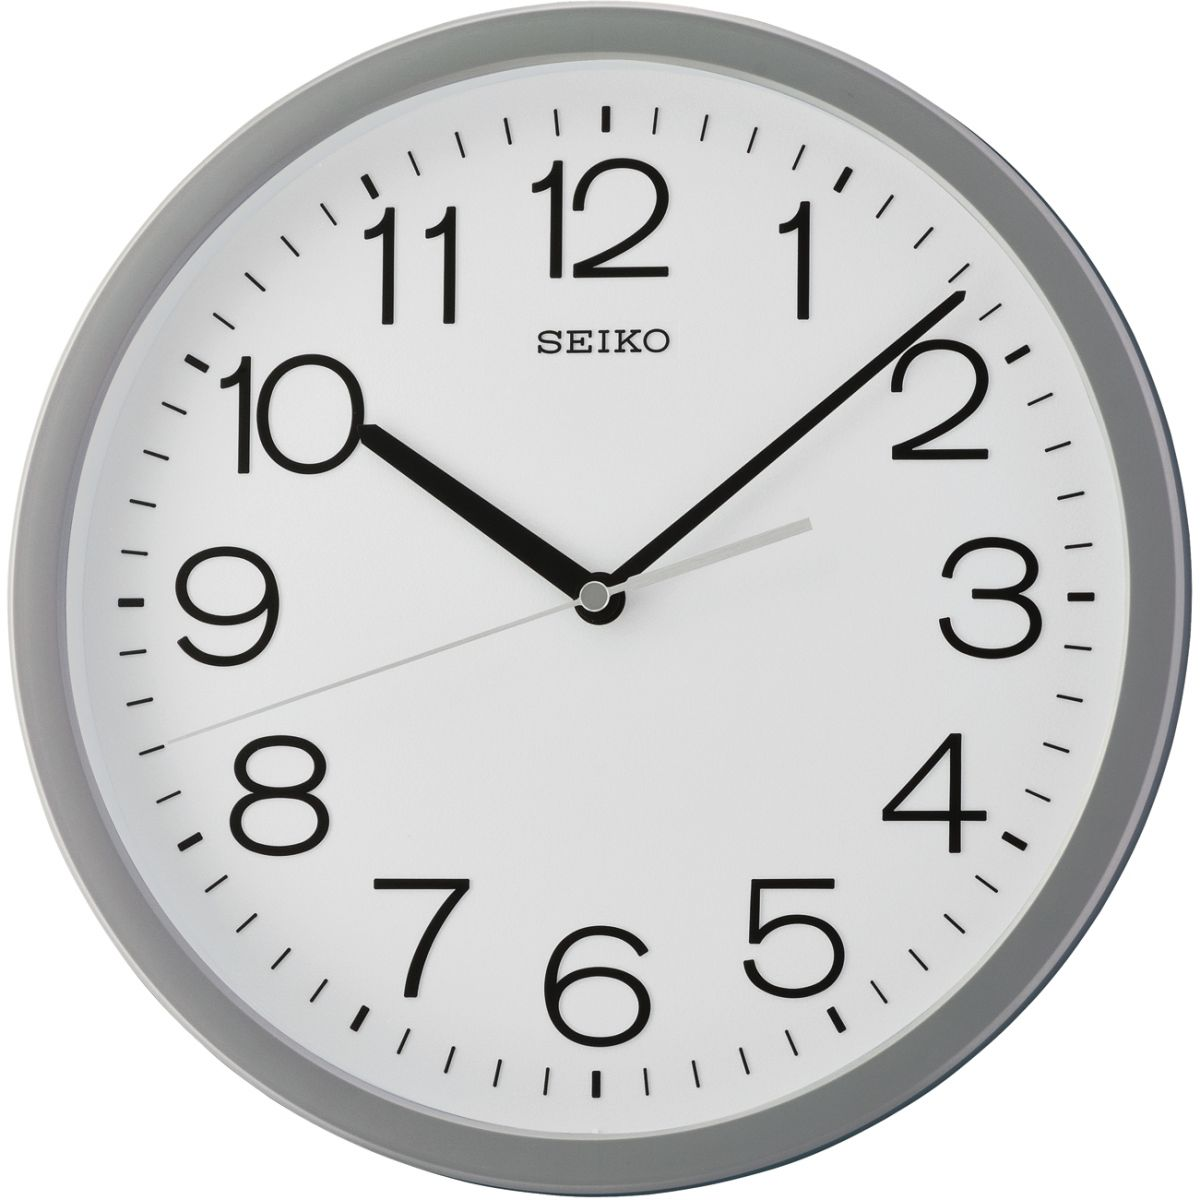 Clock Seiko Clocks Wall Clock Watch Qxa693n Watchshop Com